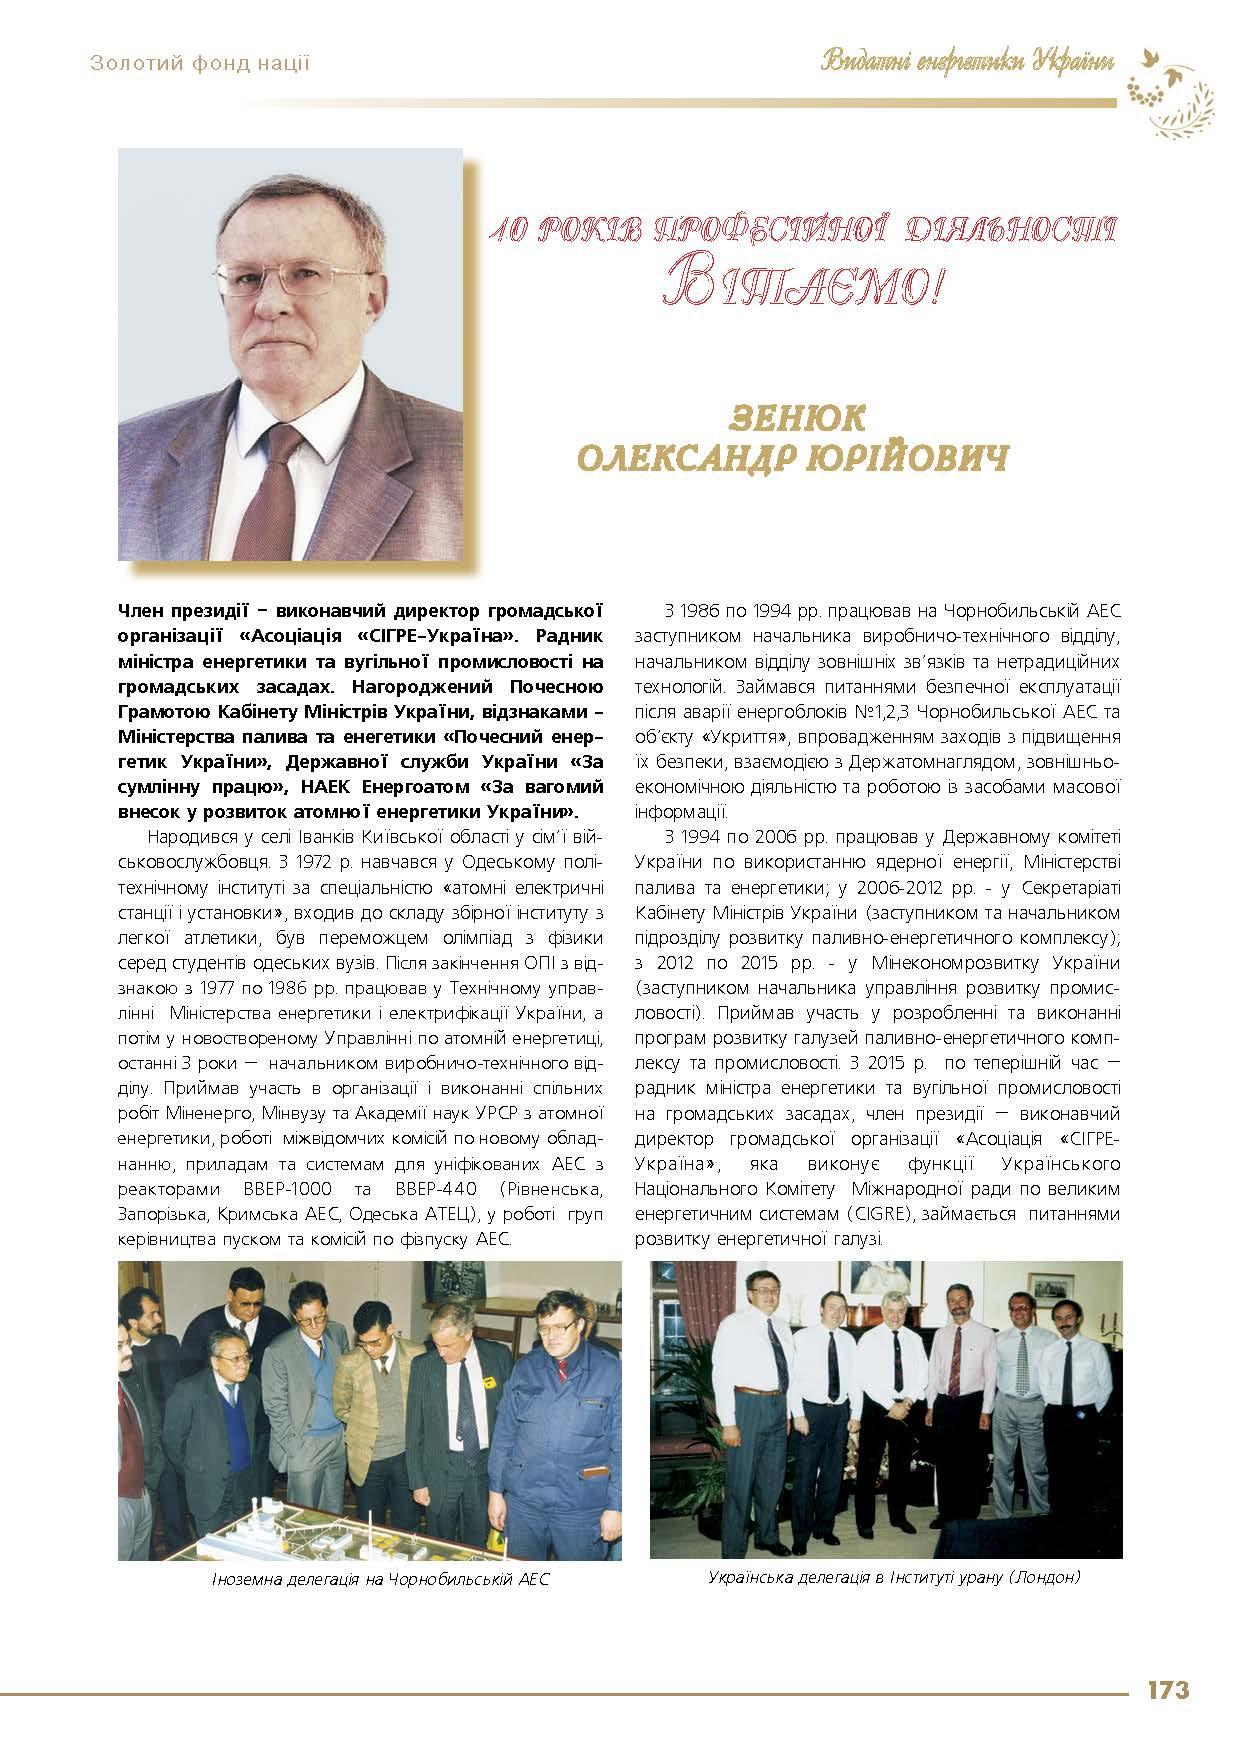 Зенюк Олександр Юрійович